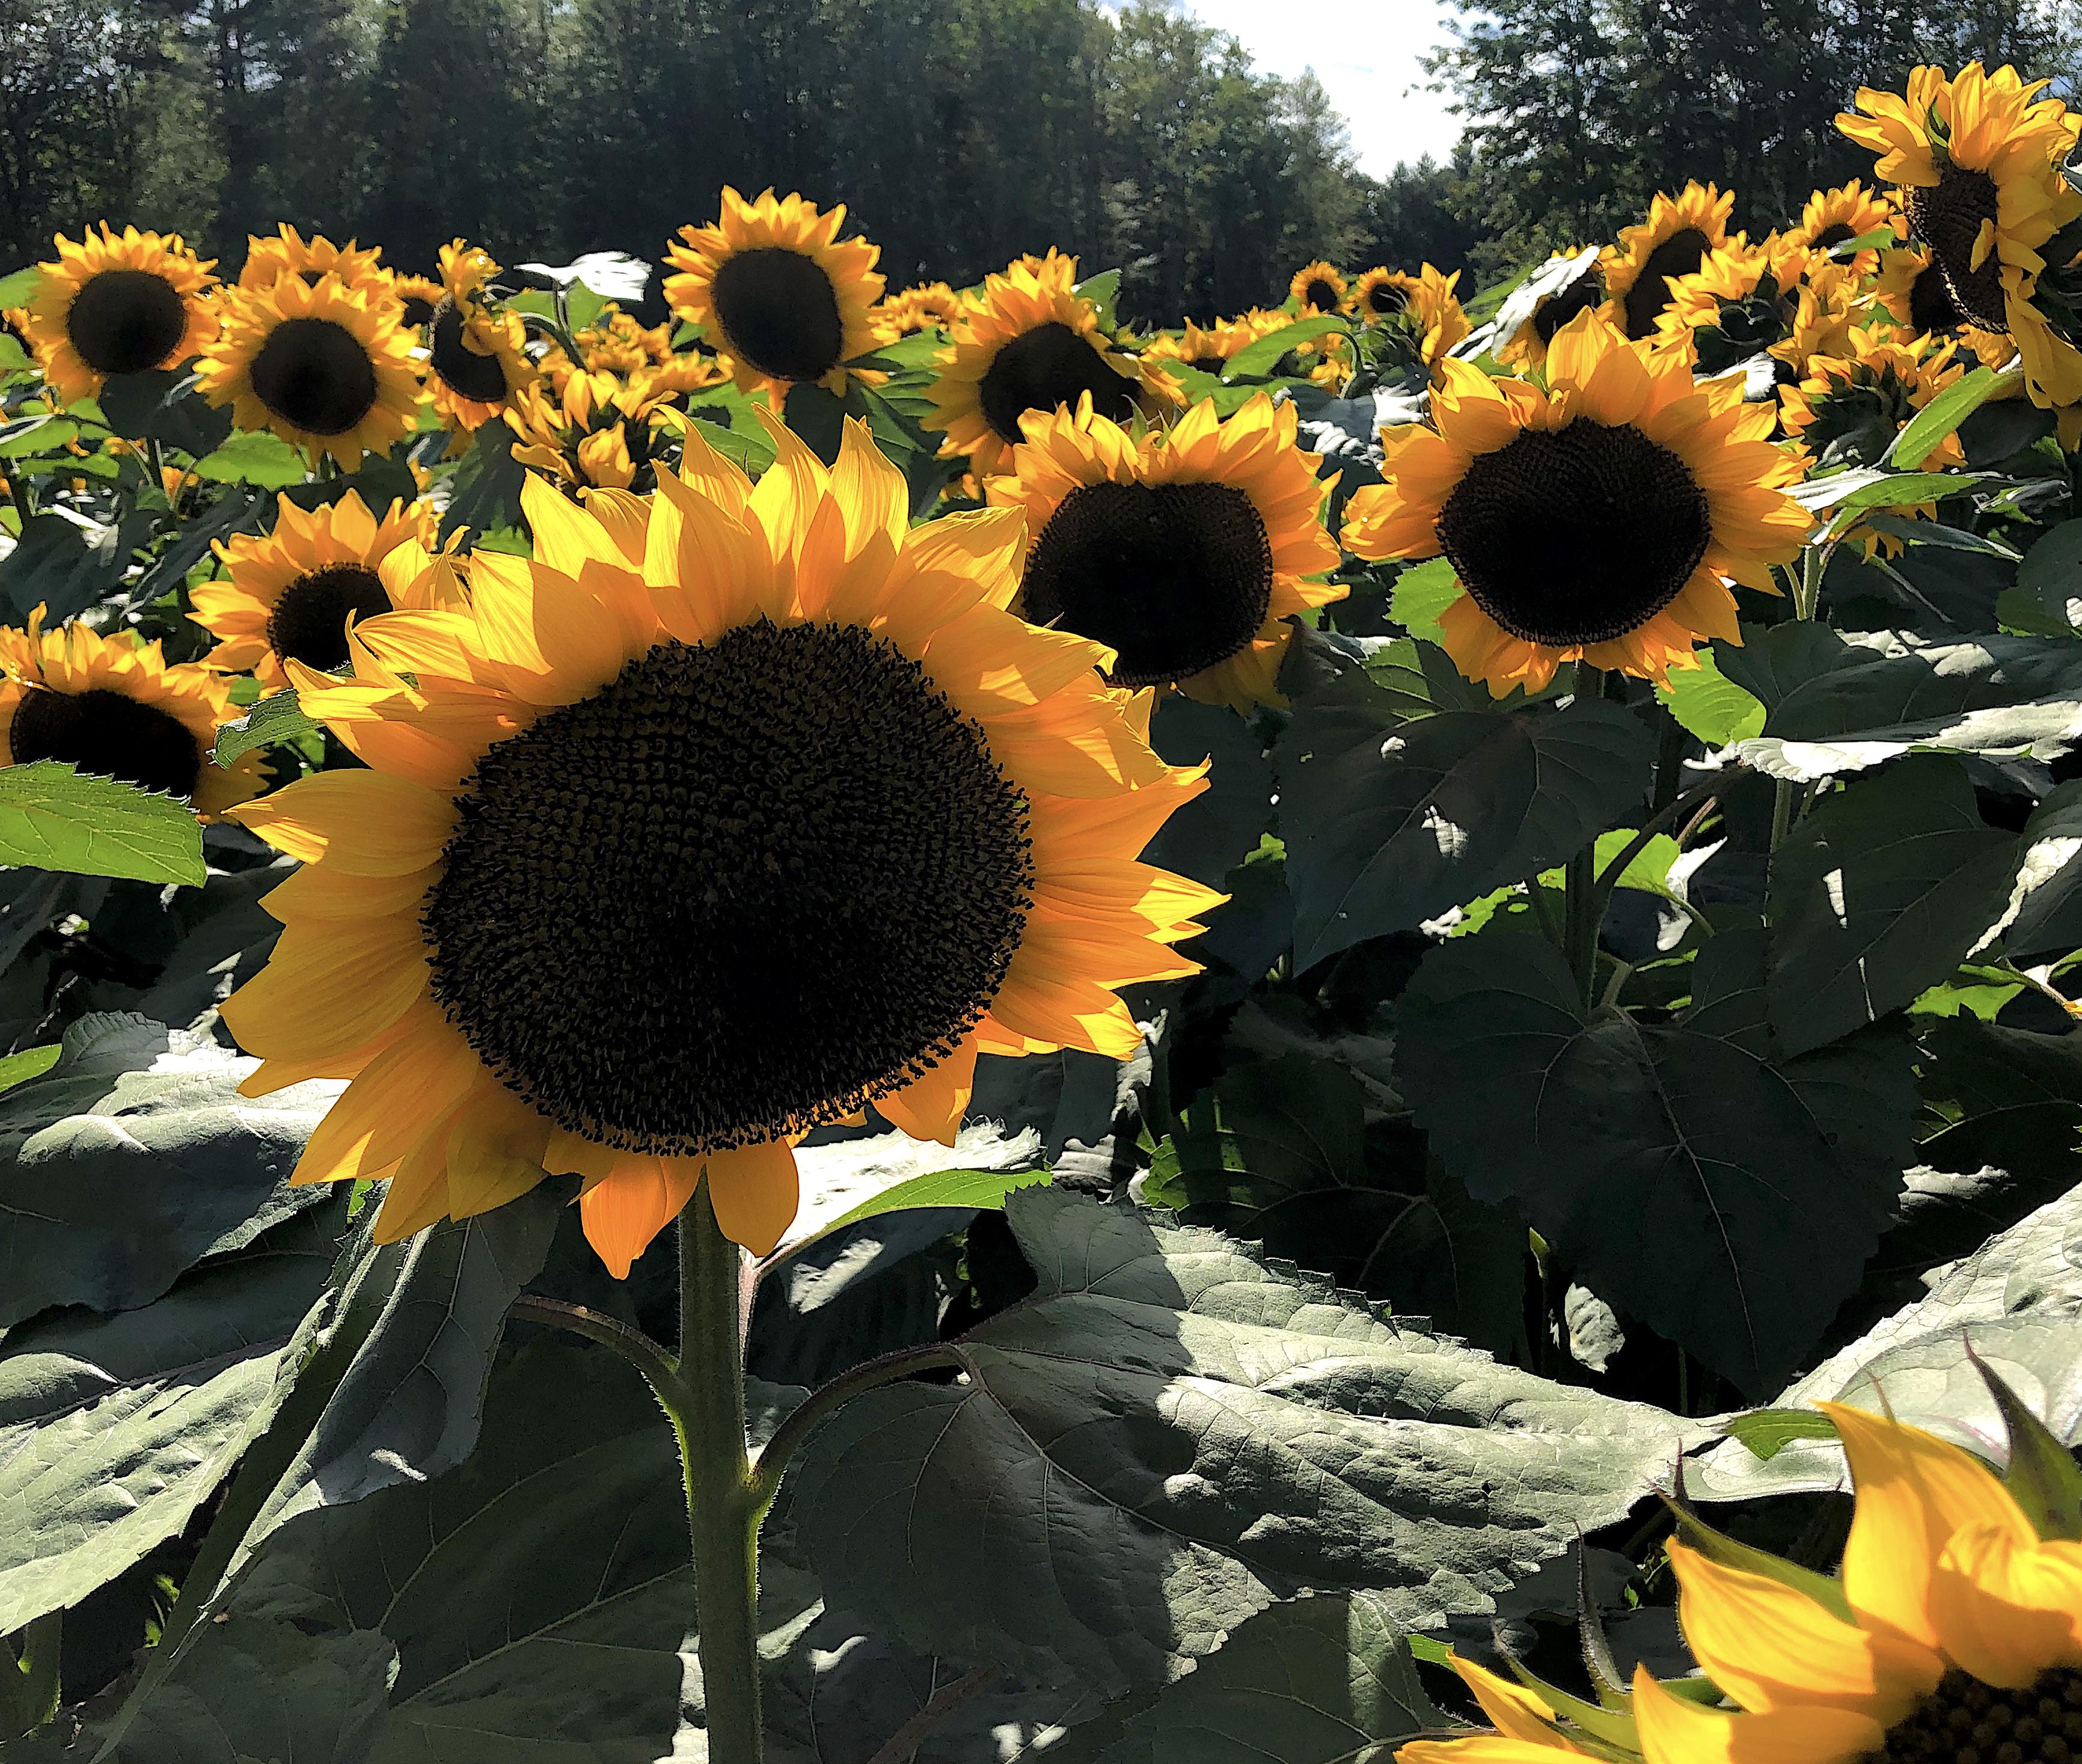 sunflowers group